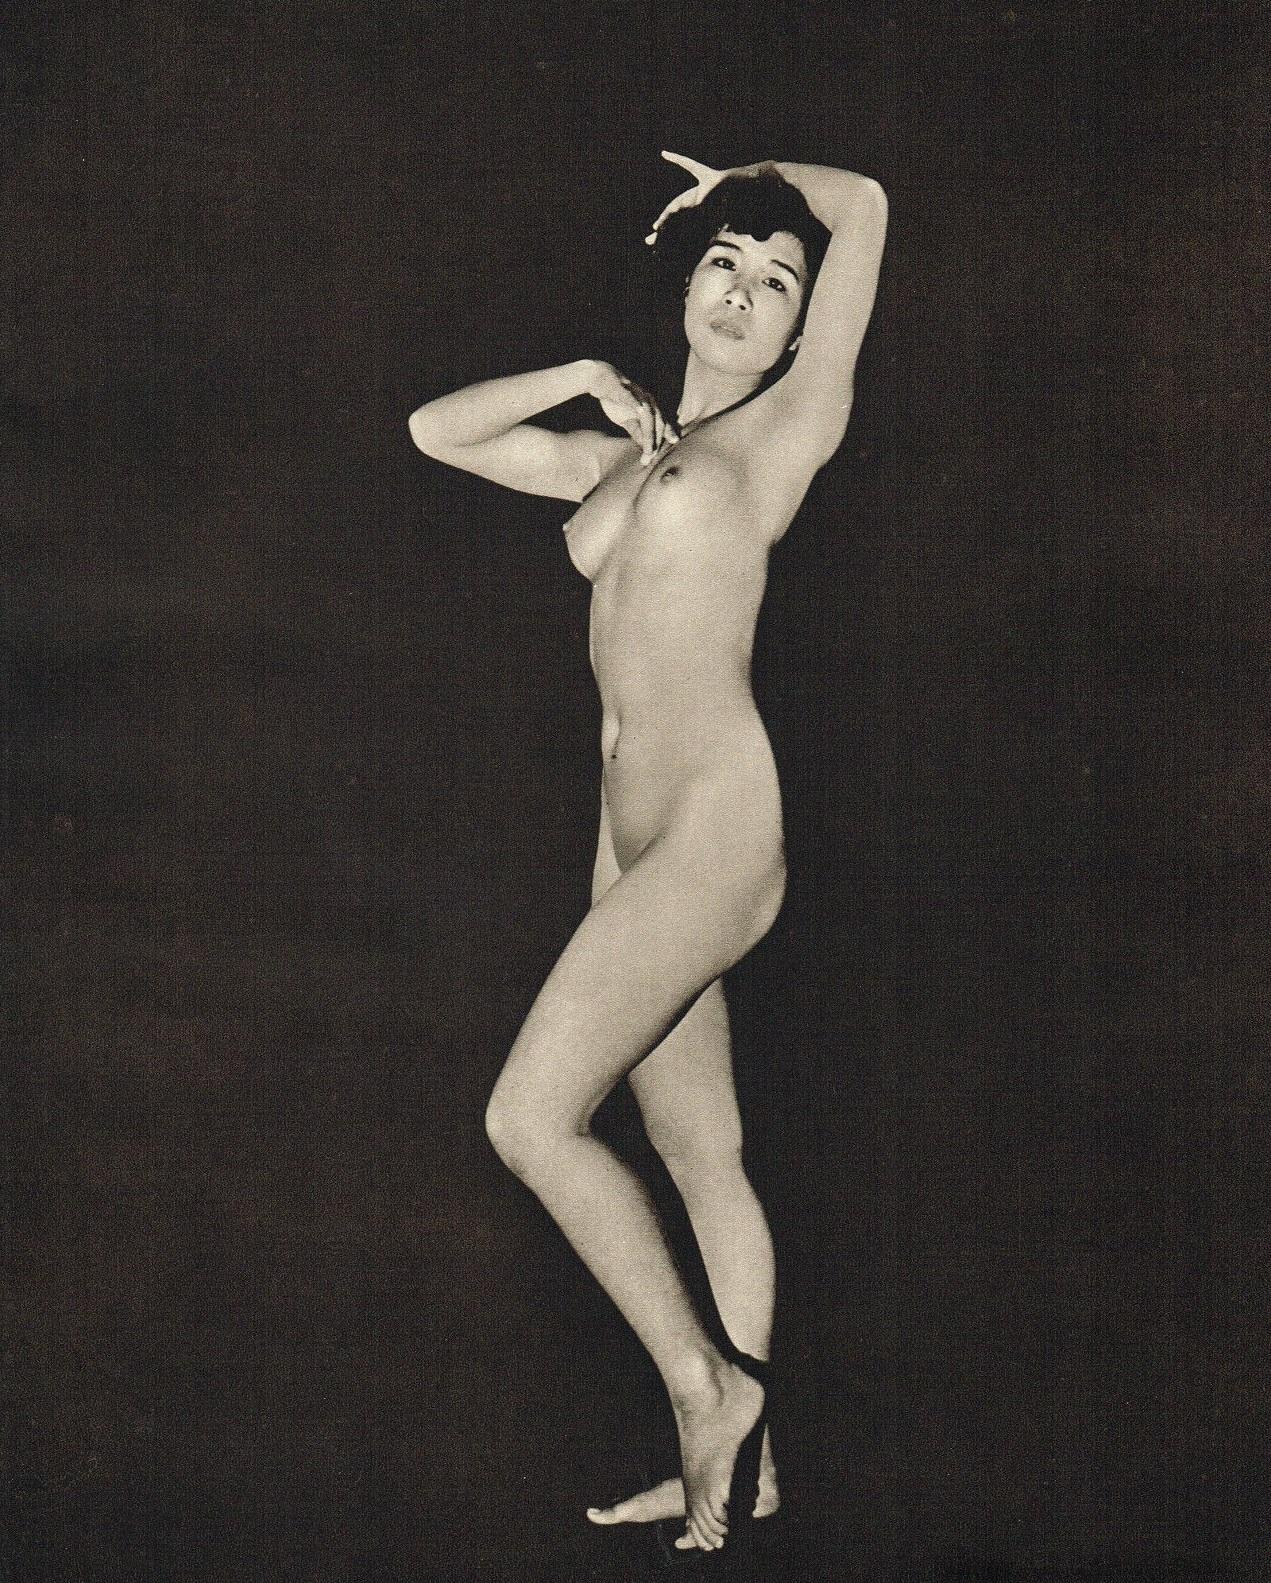 John Everard Japanese Nude photogravure 1950Oriental Model Published by Robert Hale Ltd., London in 1955.